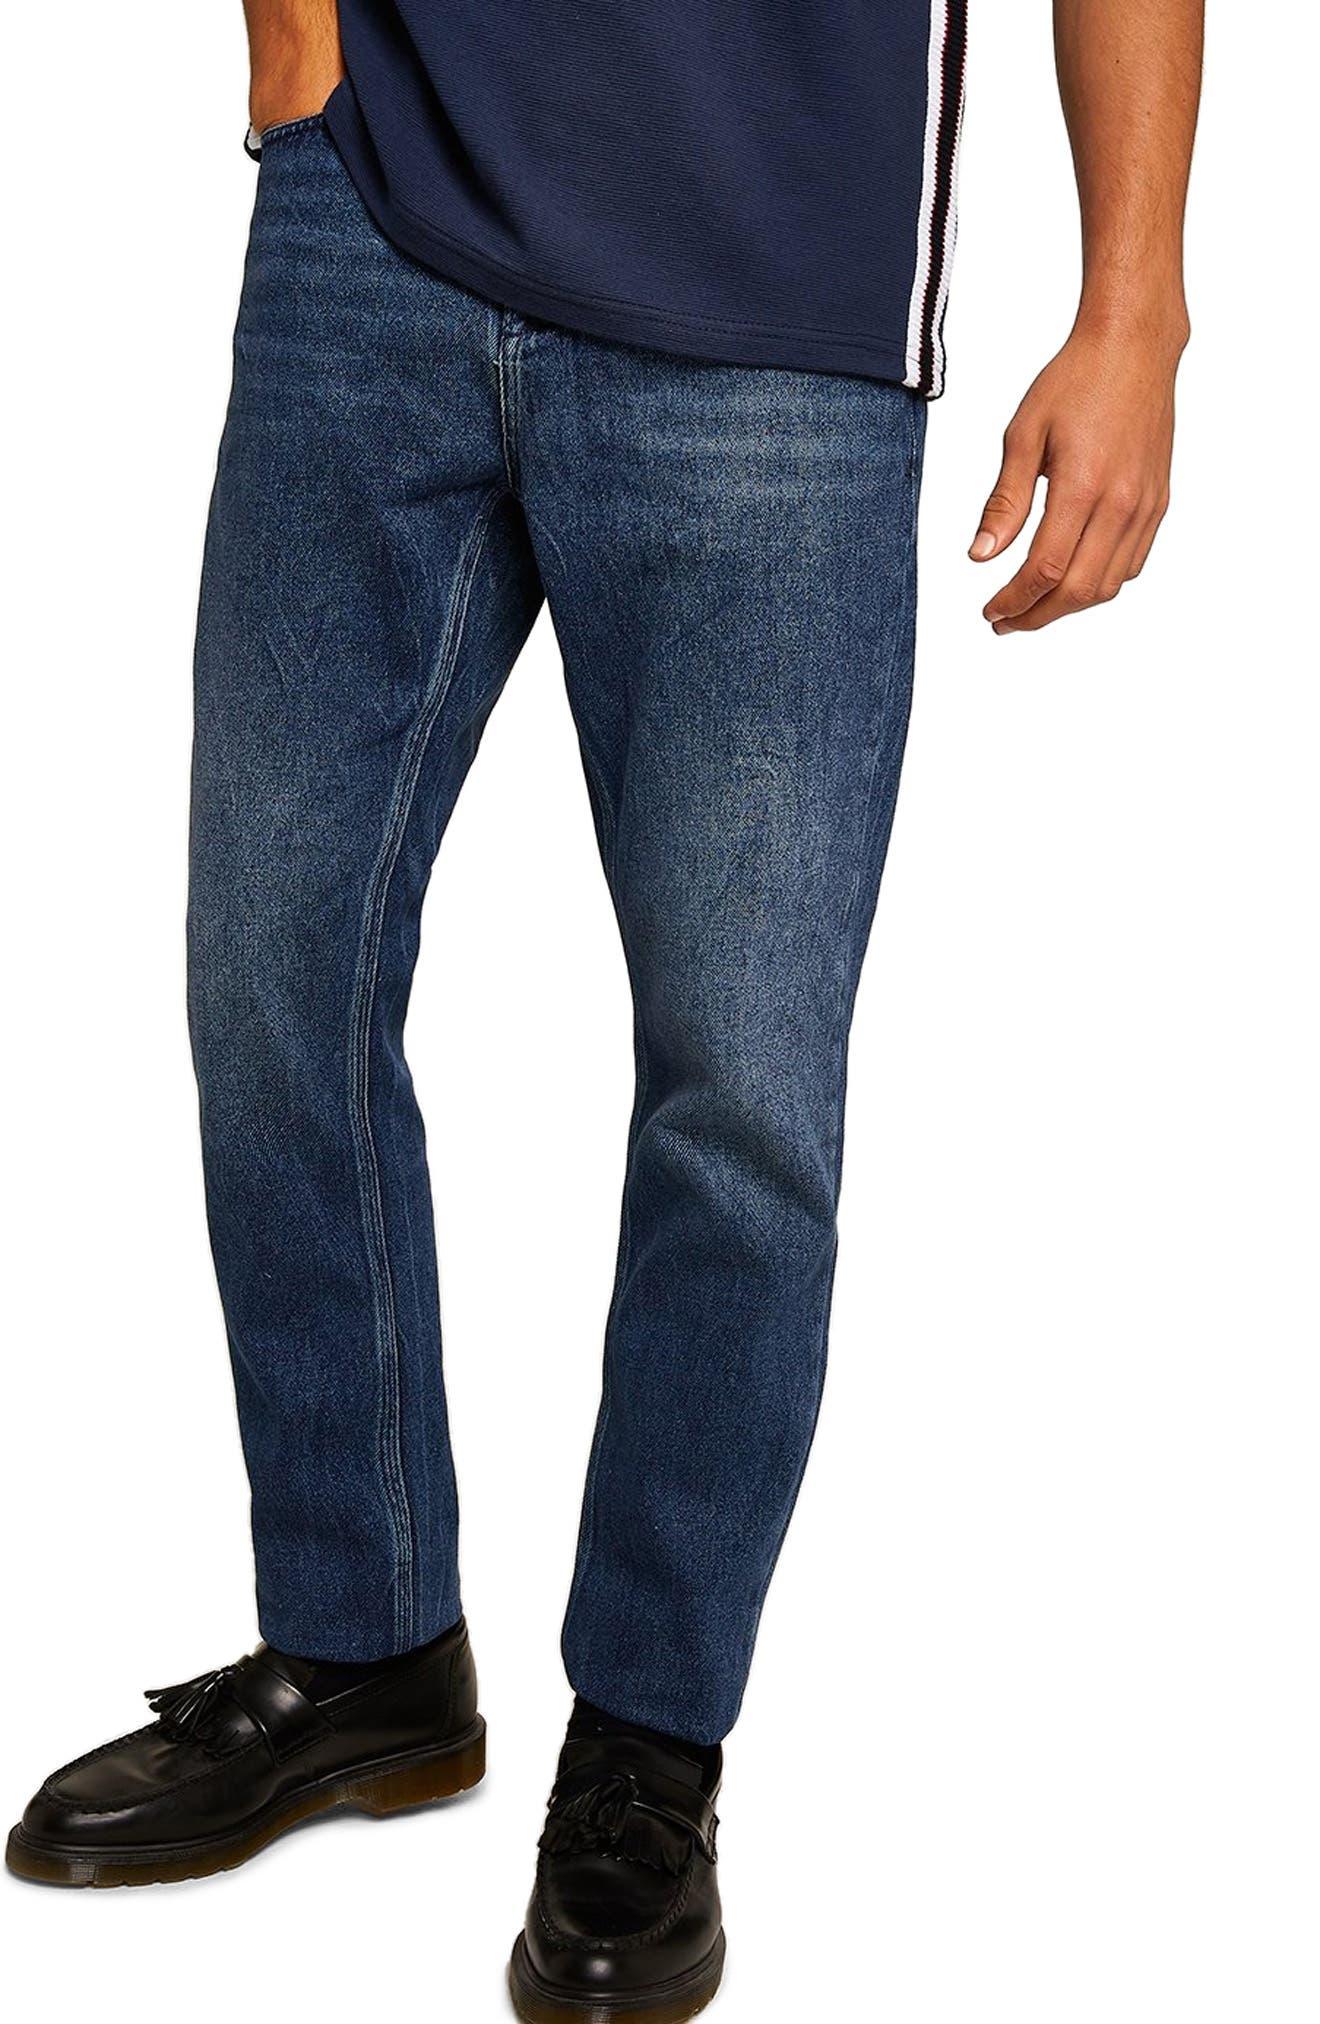 Cupid Rigid Taper Jeans,                             Main thumbnail 1, color,                             DARK BLUE